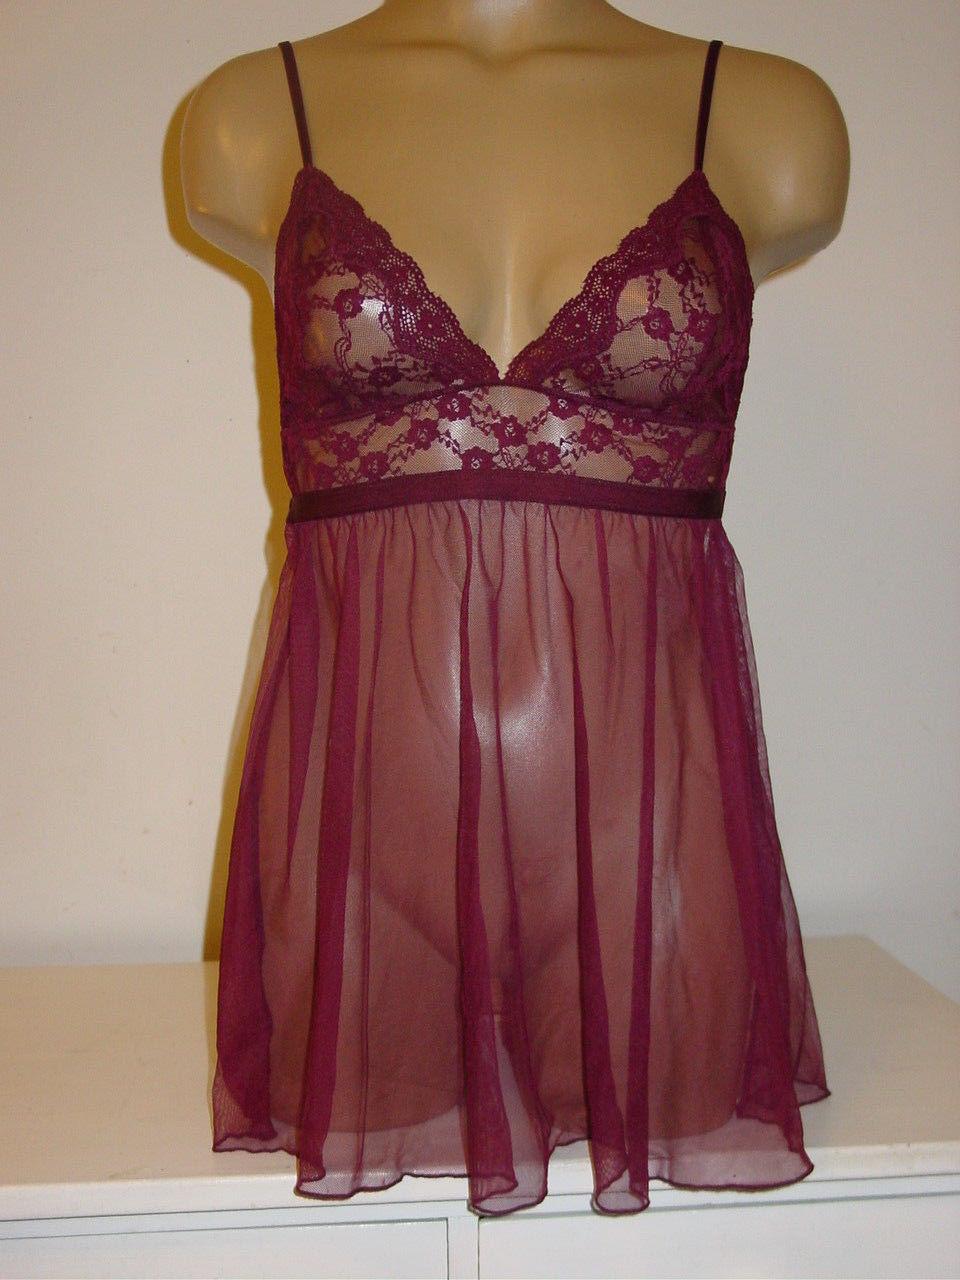 4952b35dbdc Victorias Secret wine burgandy lace sheer mesh nightie babydoll  chemise-M-defect -  9.46